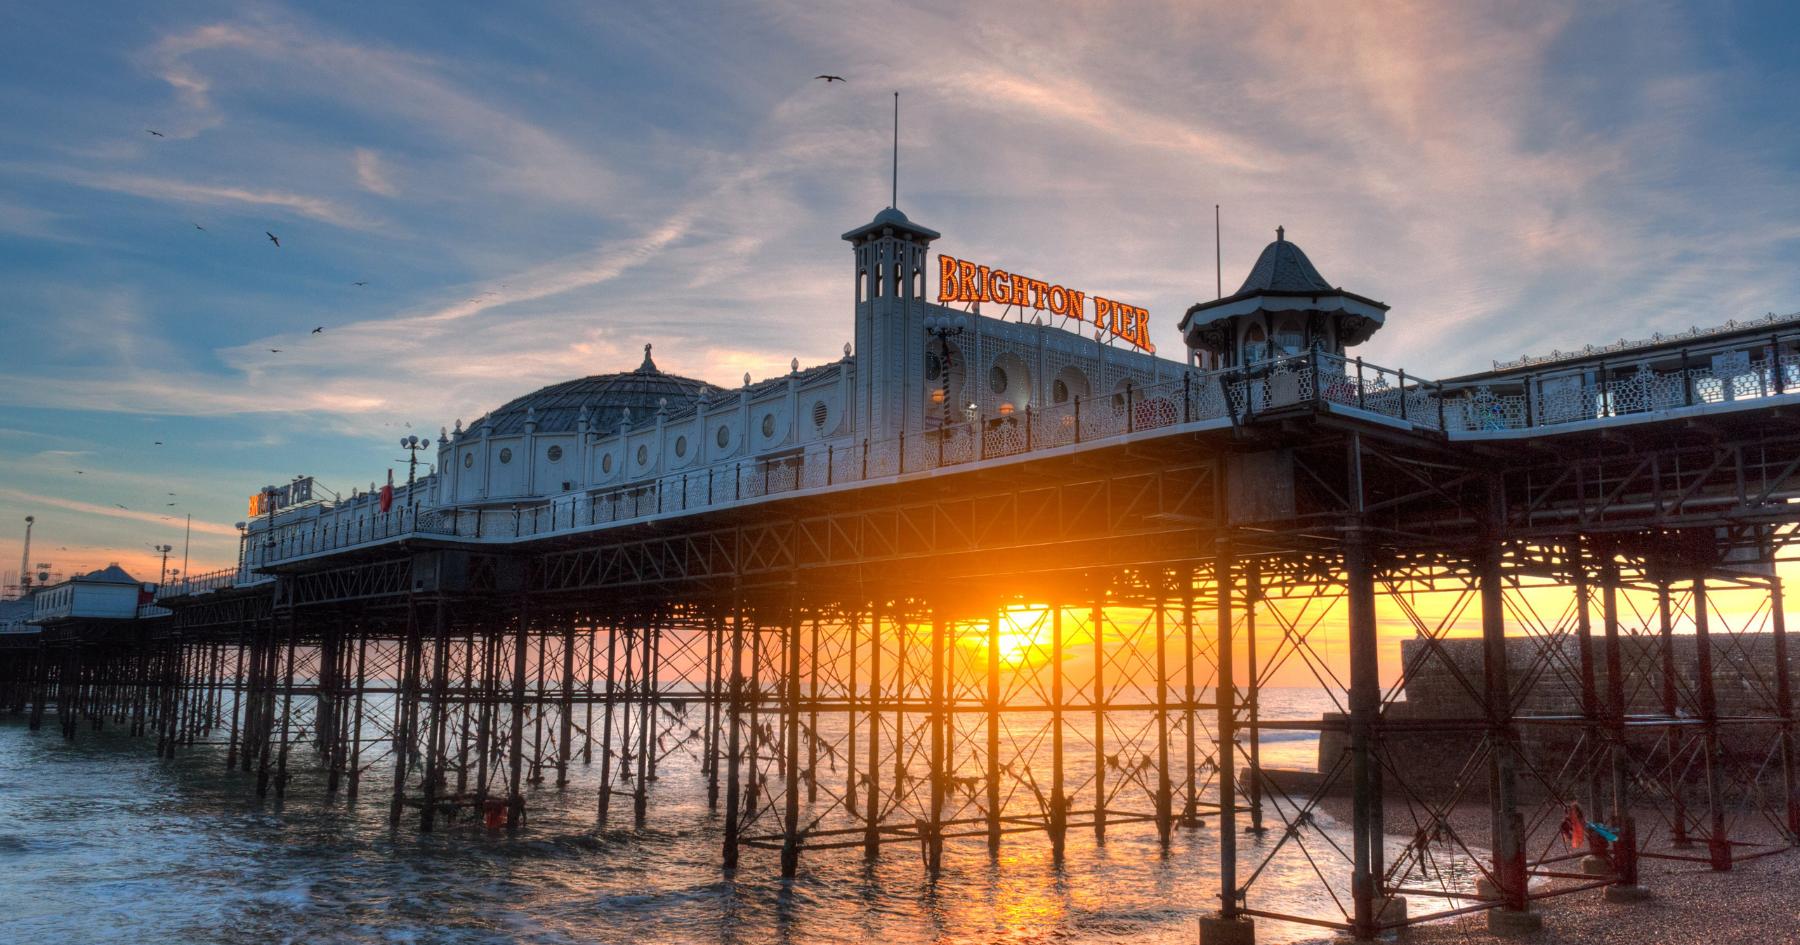 Our favourite business logo designs in Brighton